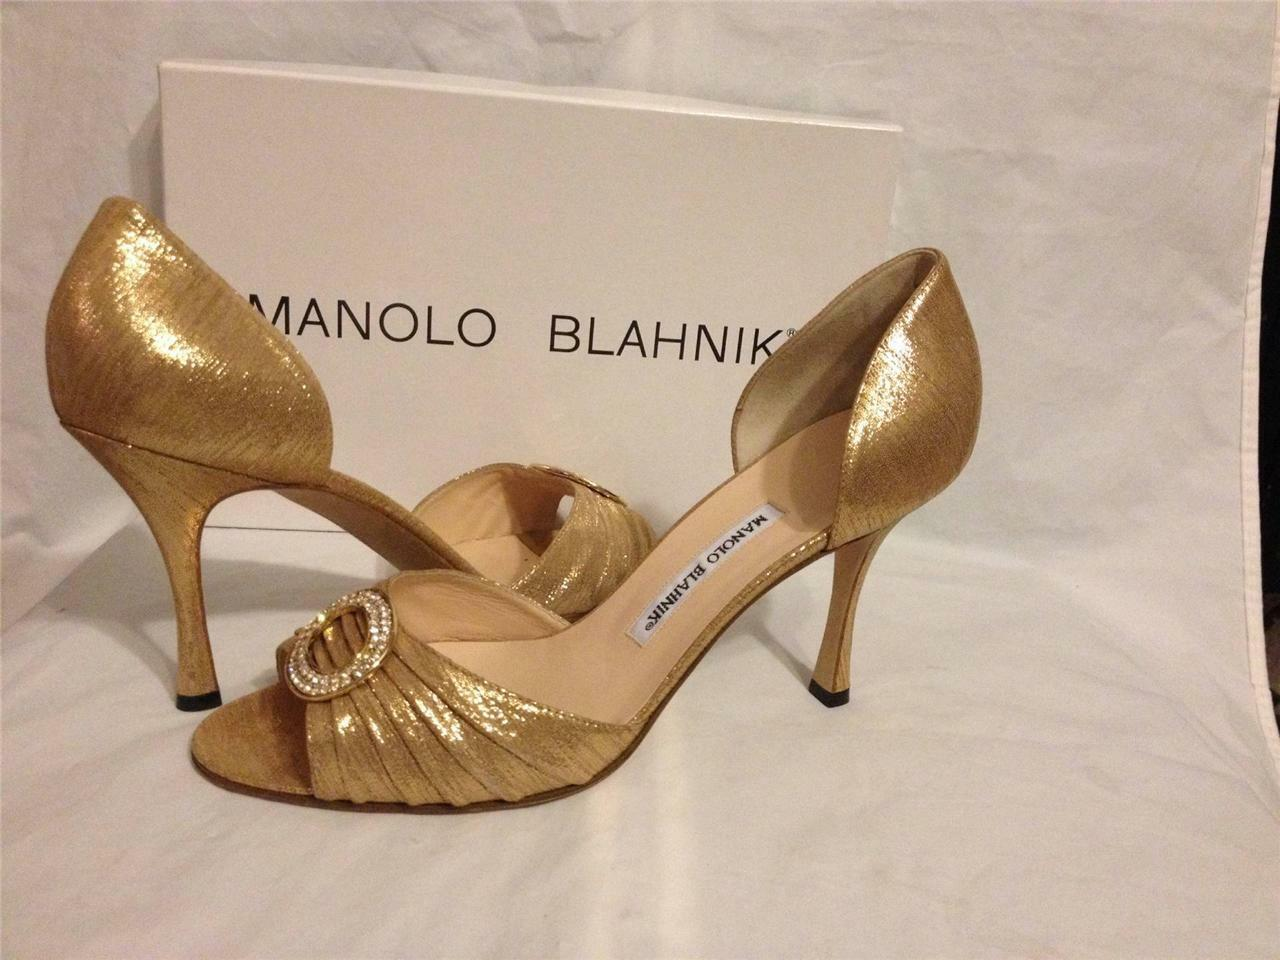 Manolo Blahnik sedaraby d'Orsay Piel De Oro Oro Oro Joya Cristal Bomba Tacones zapatos  755 c909f8